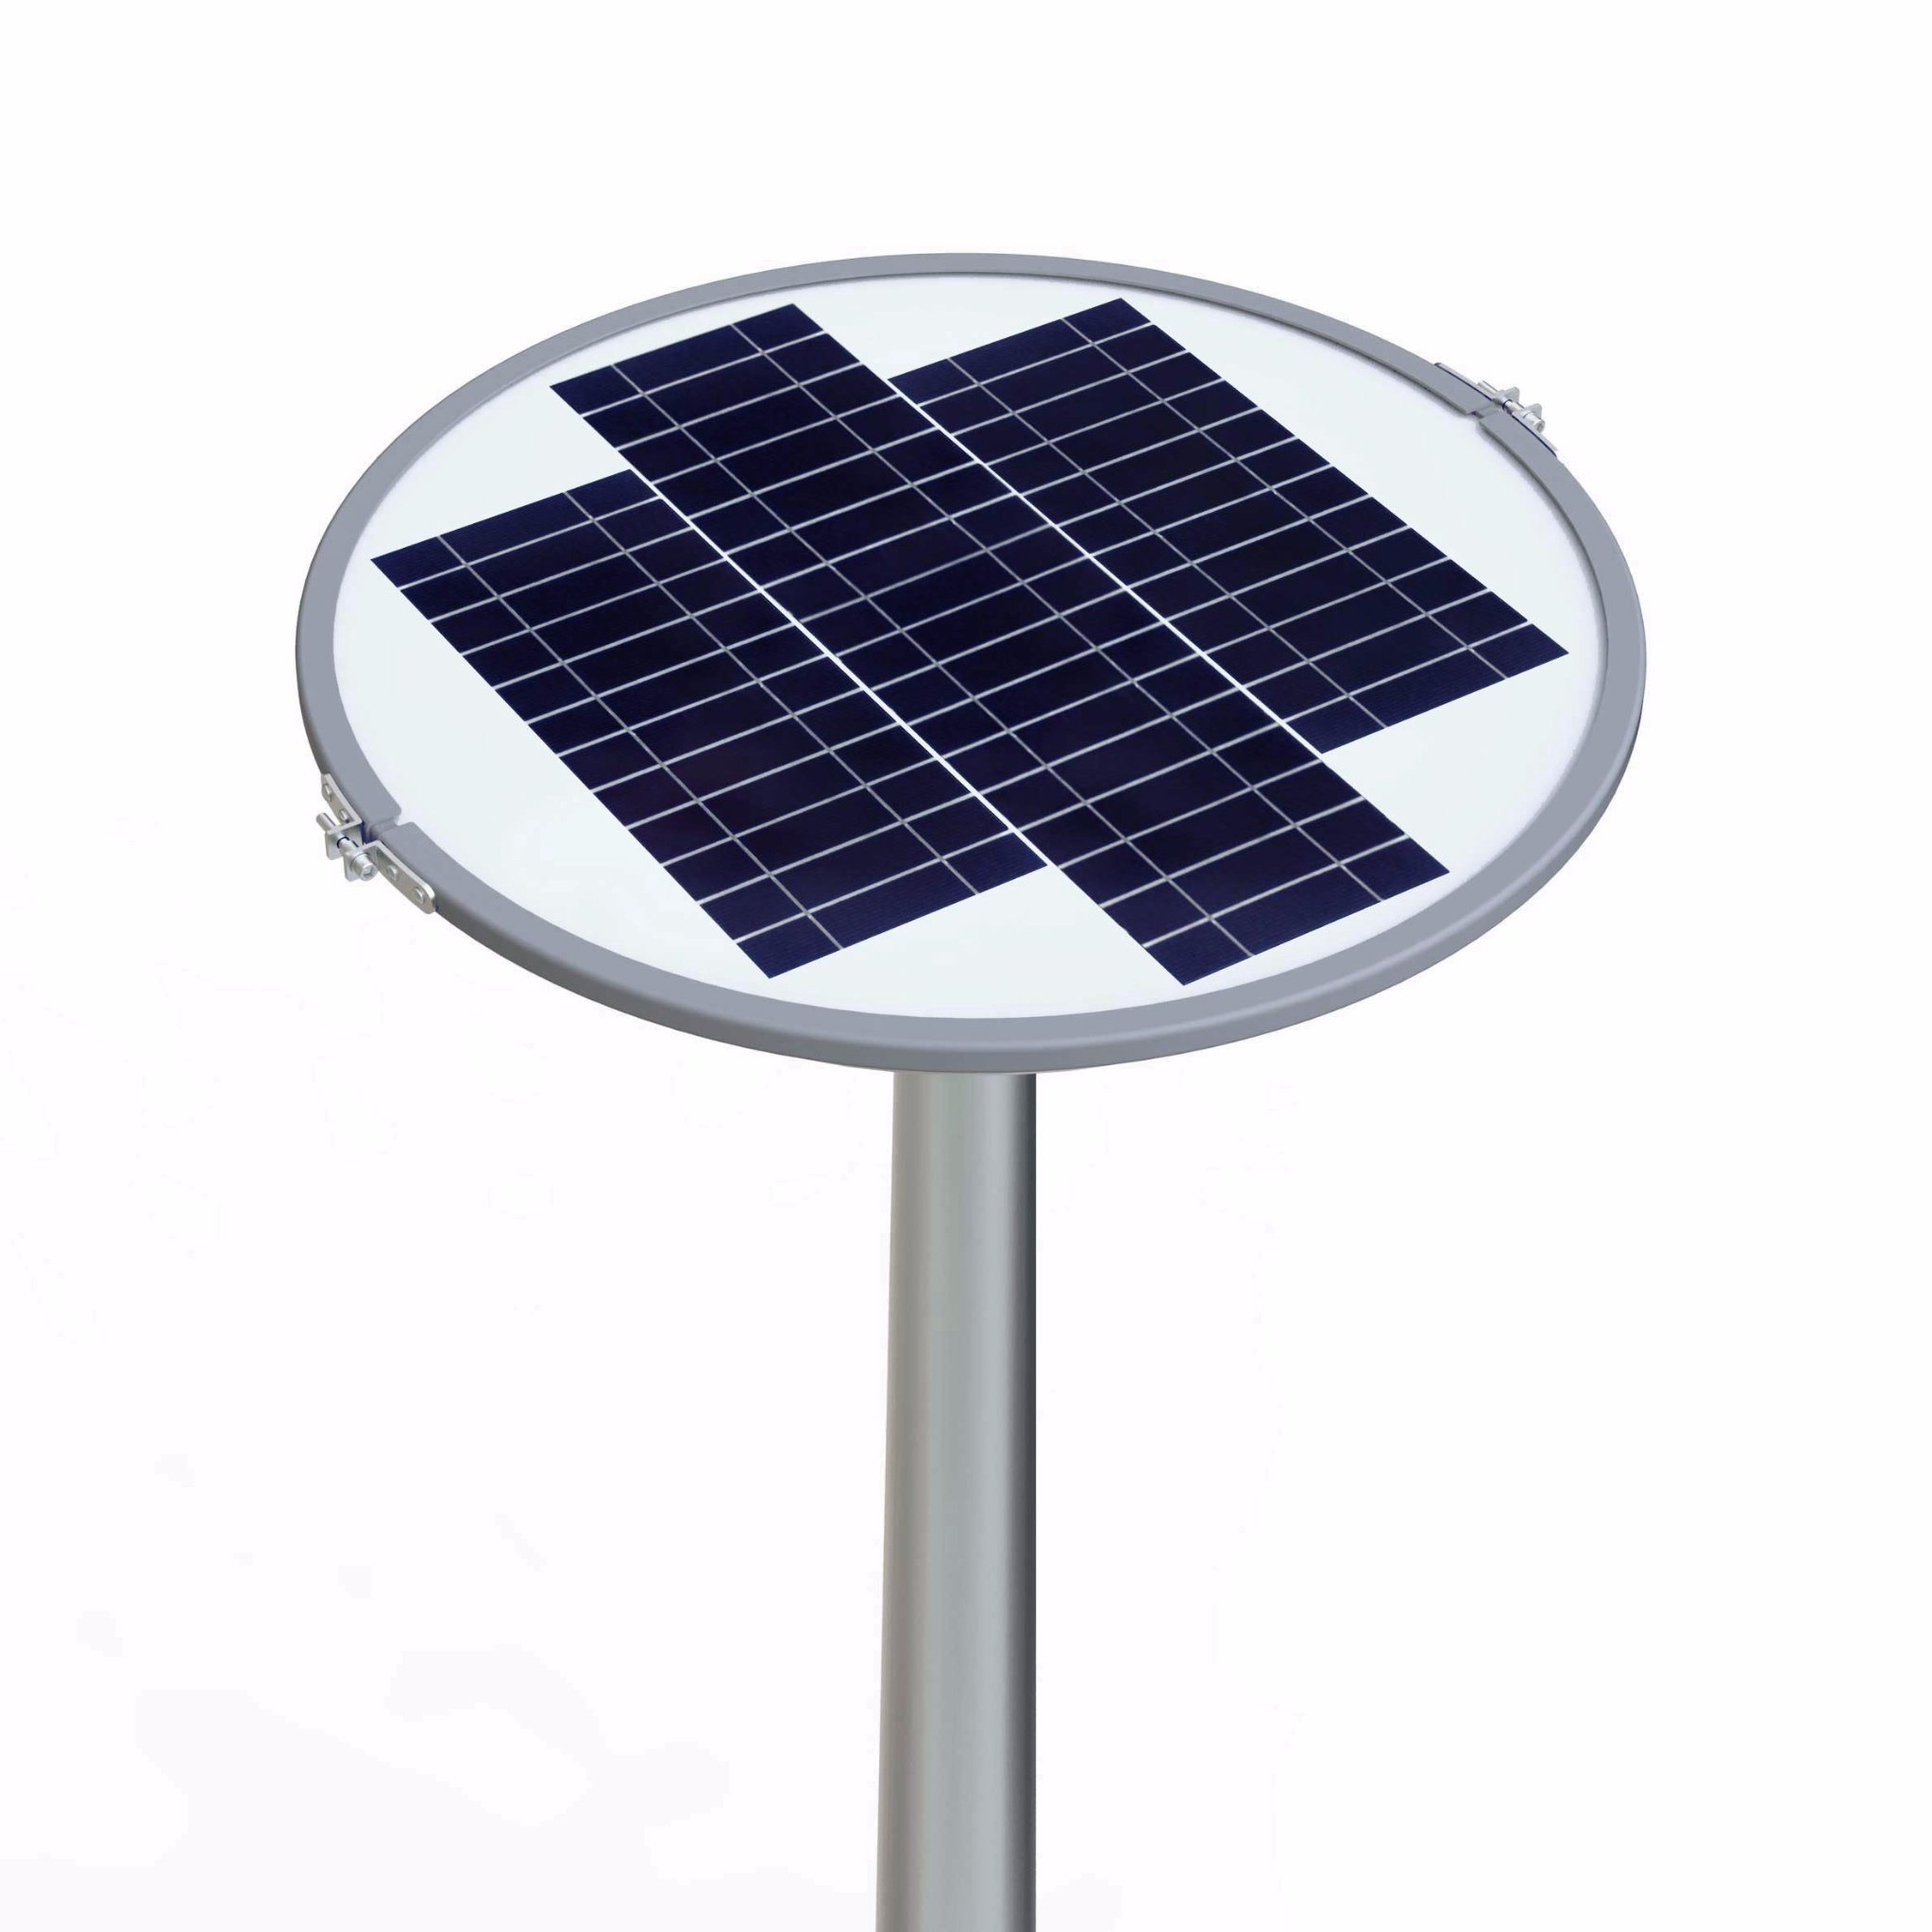 Sresky out Door Pole Mount Street Solar Light Tall Light Waterproof